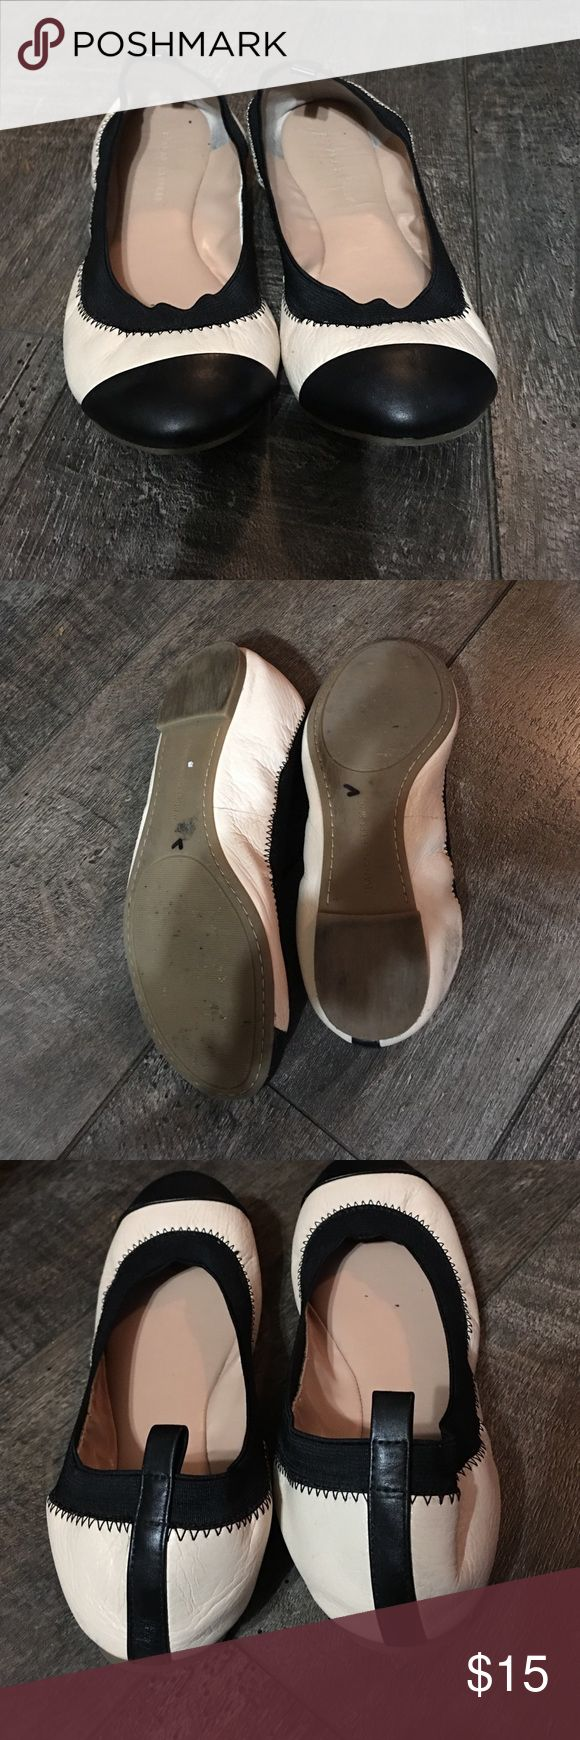 Banana Republic flats Banana Republic ballerina flats patent leather cream with black Banana Republic Shoes Flats & Loafers